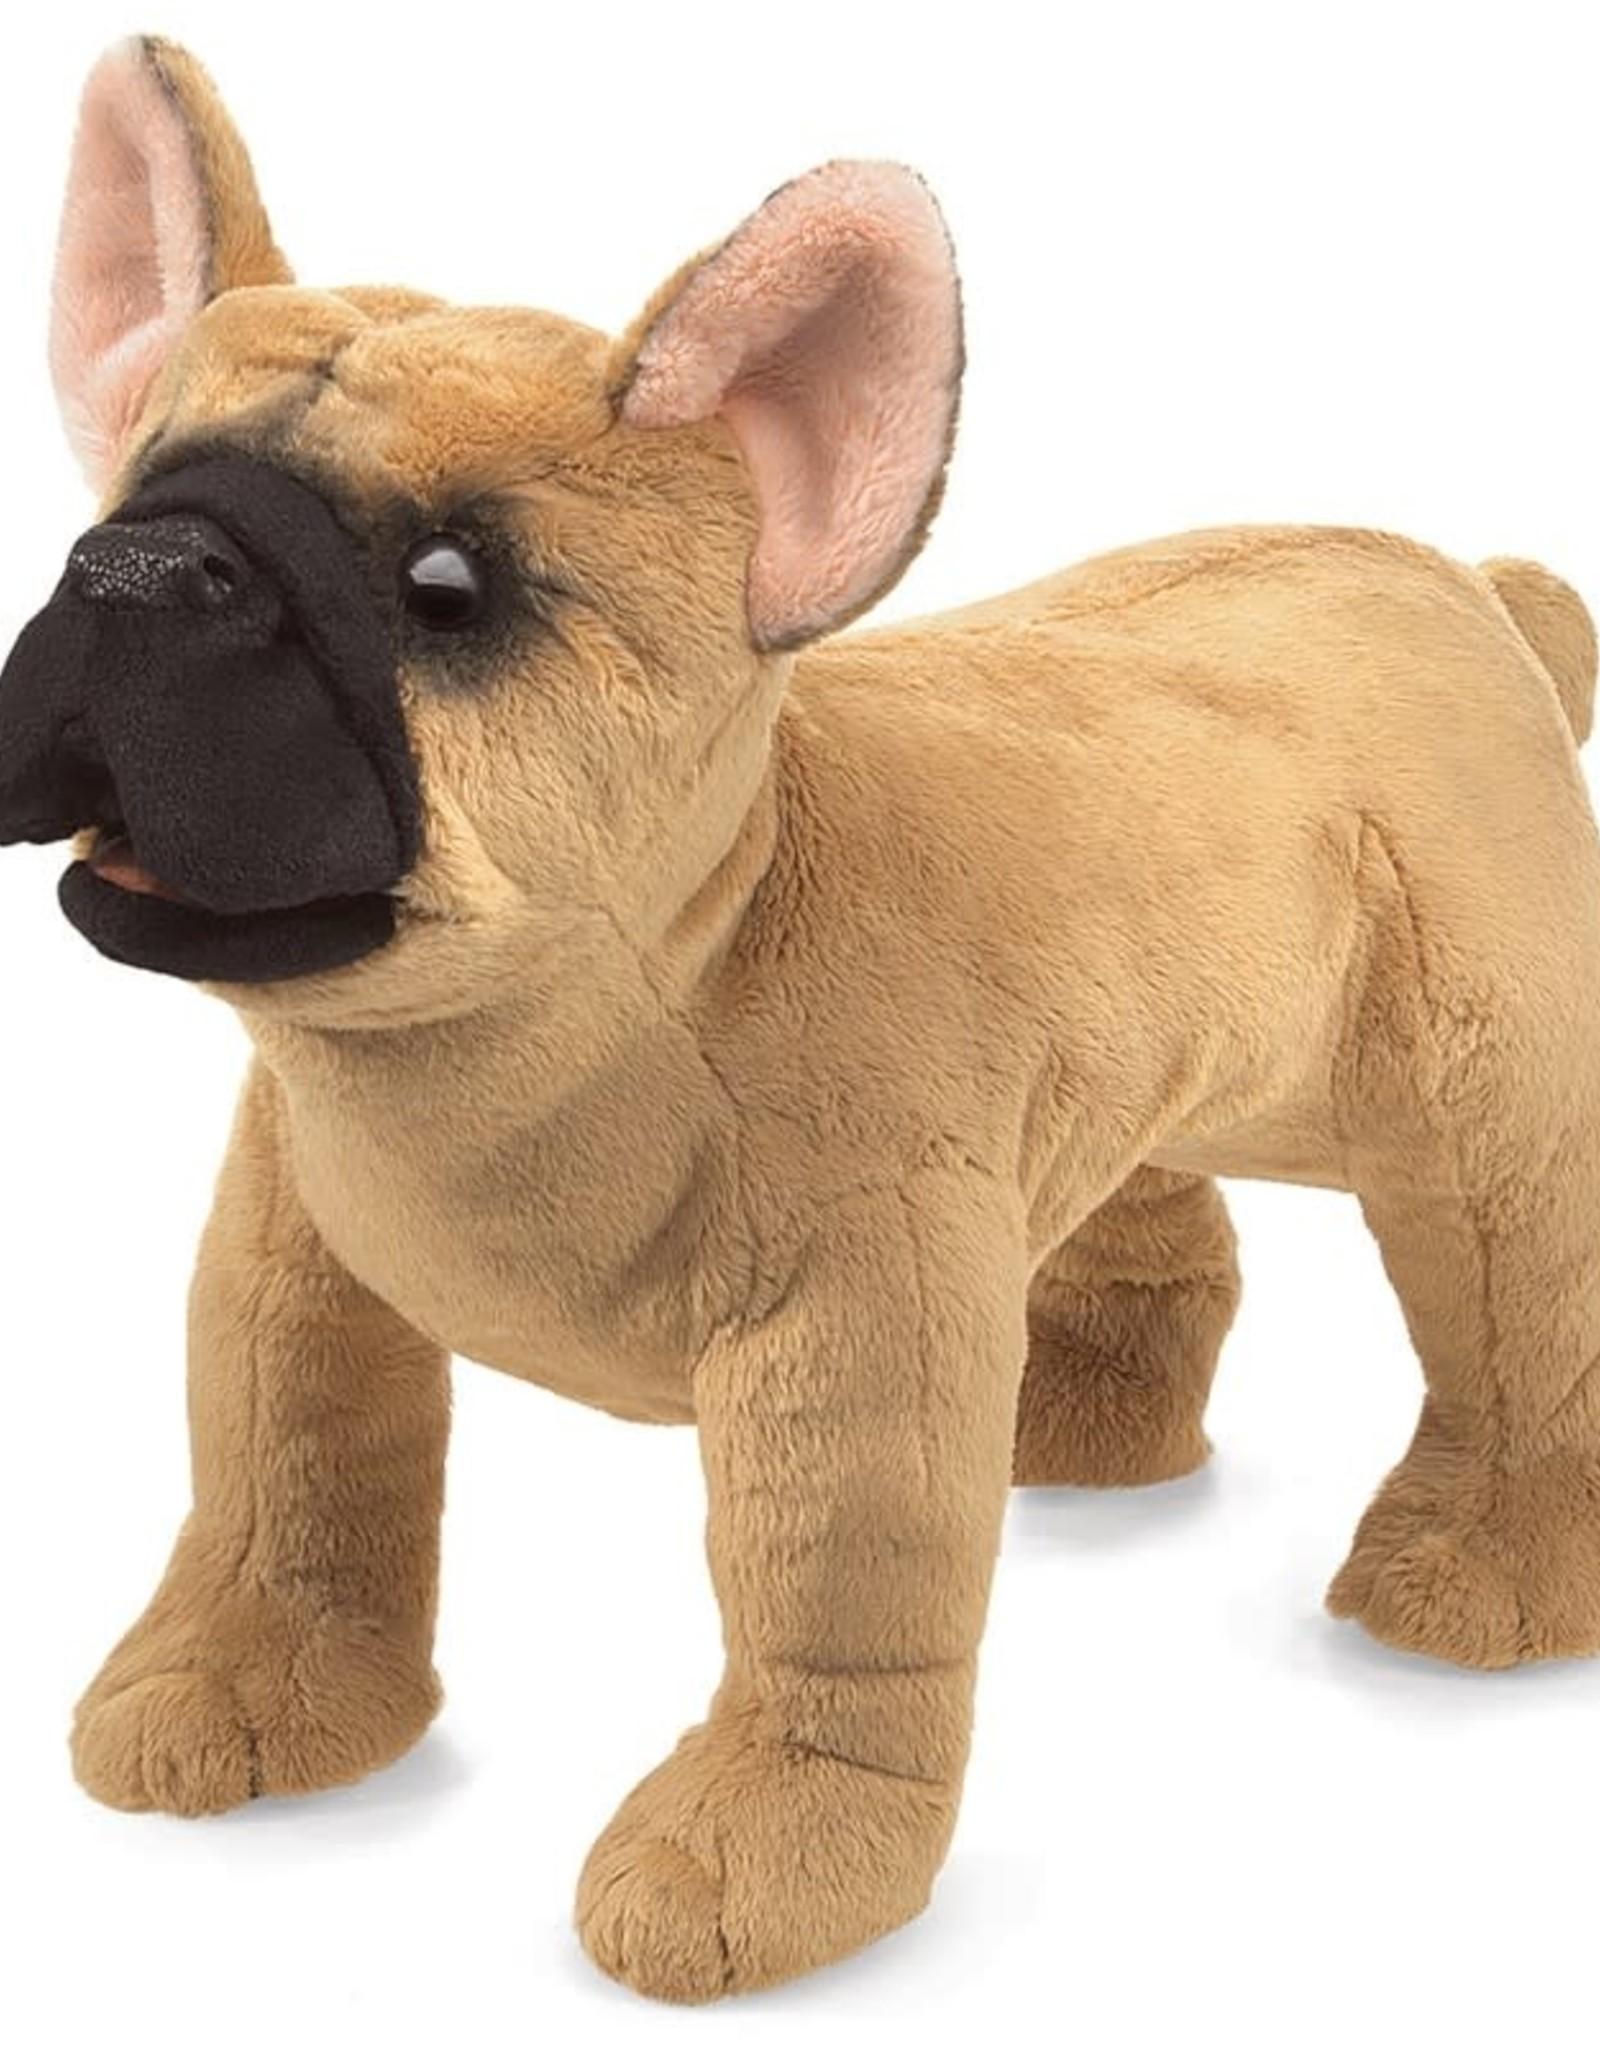 French Bulldog puppet